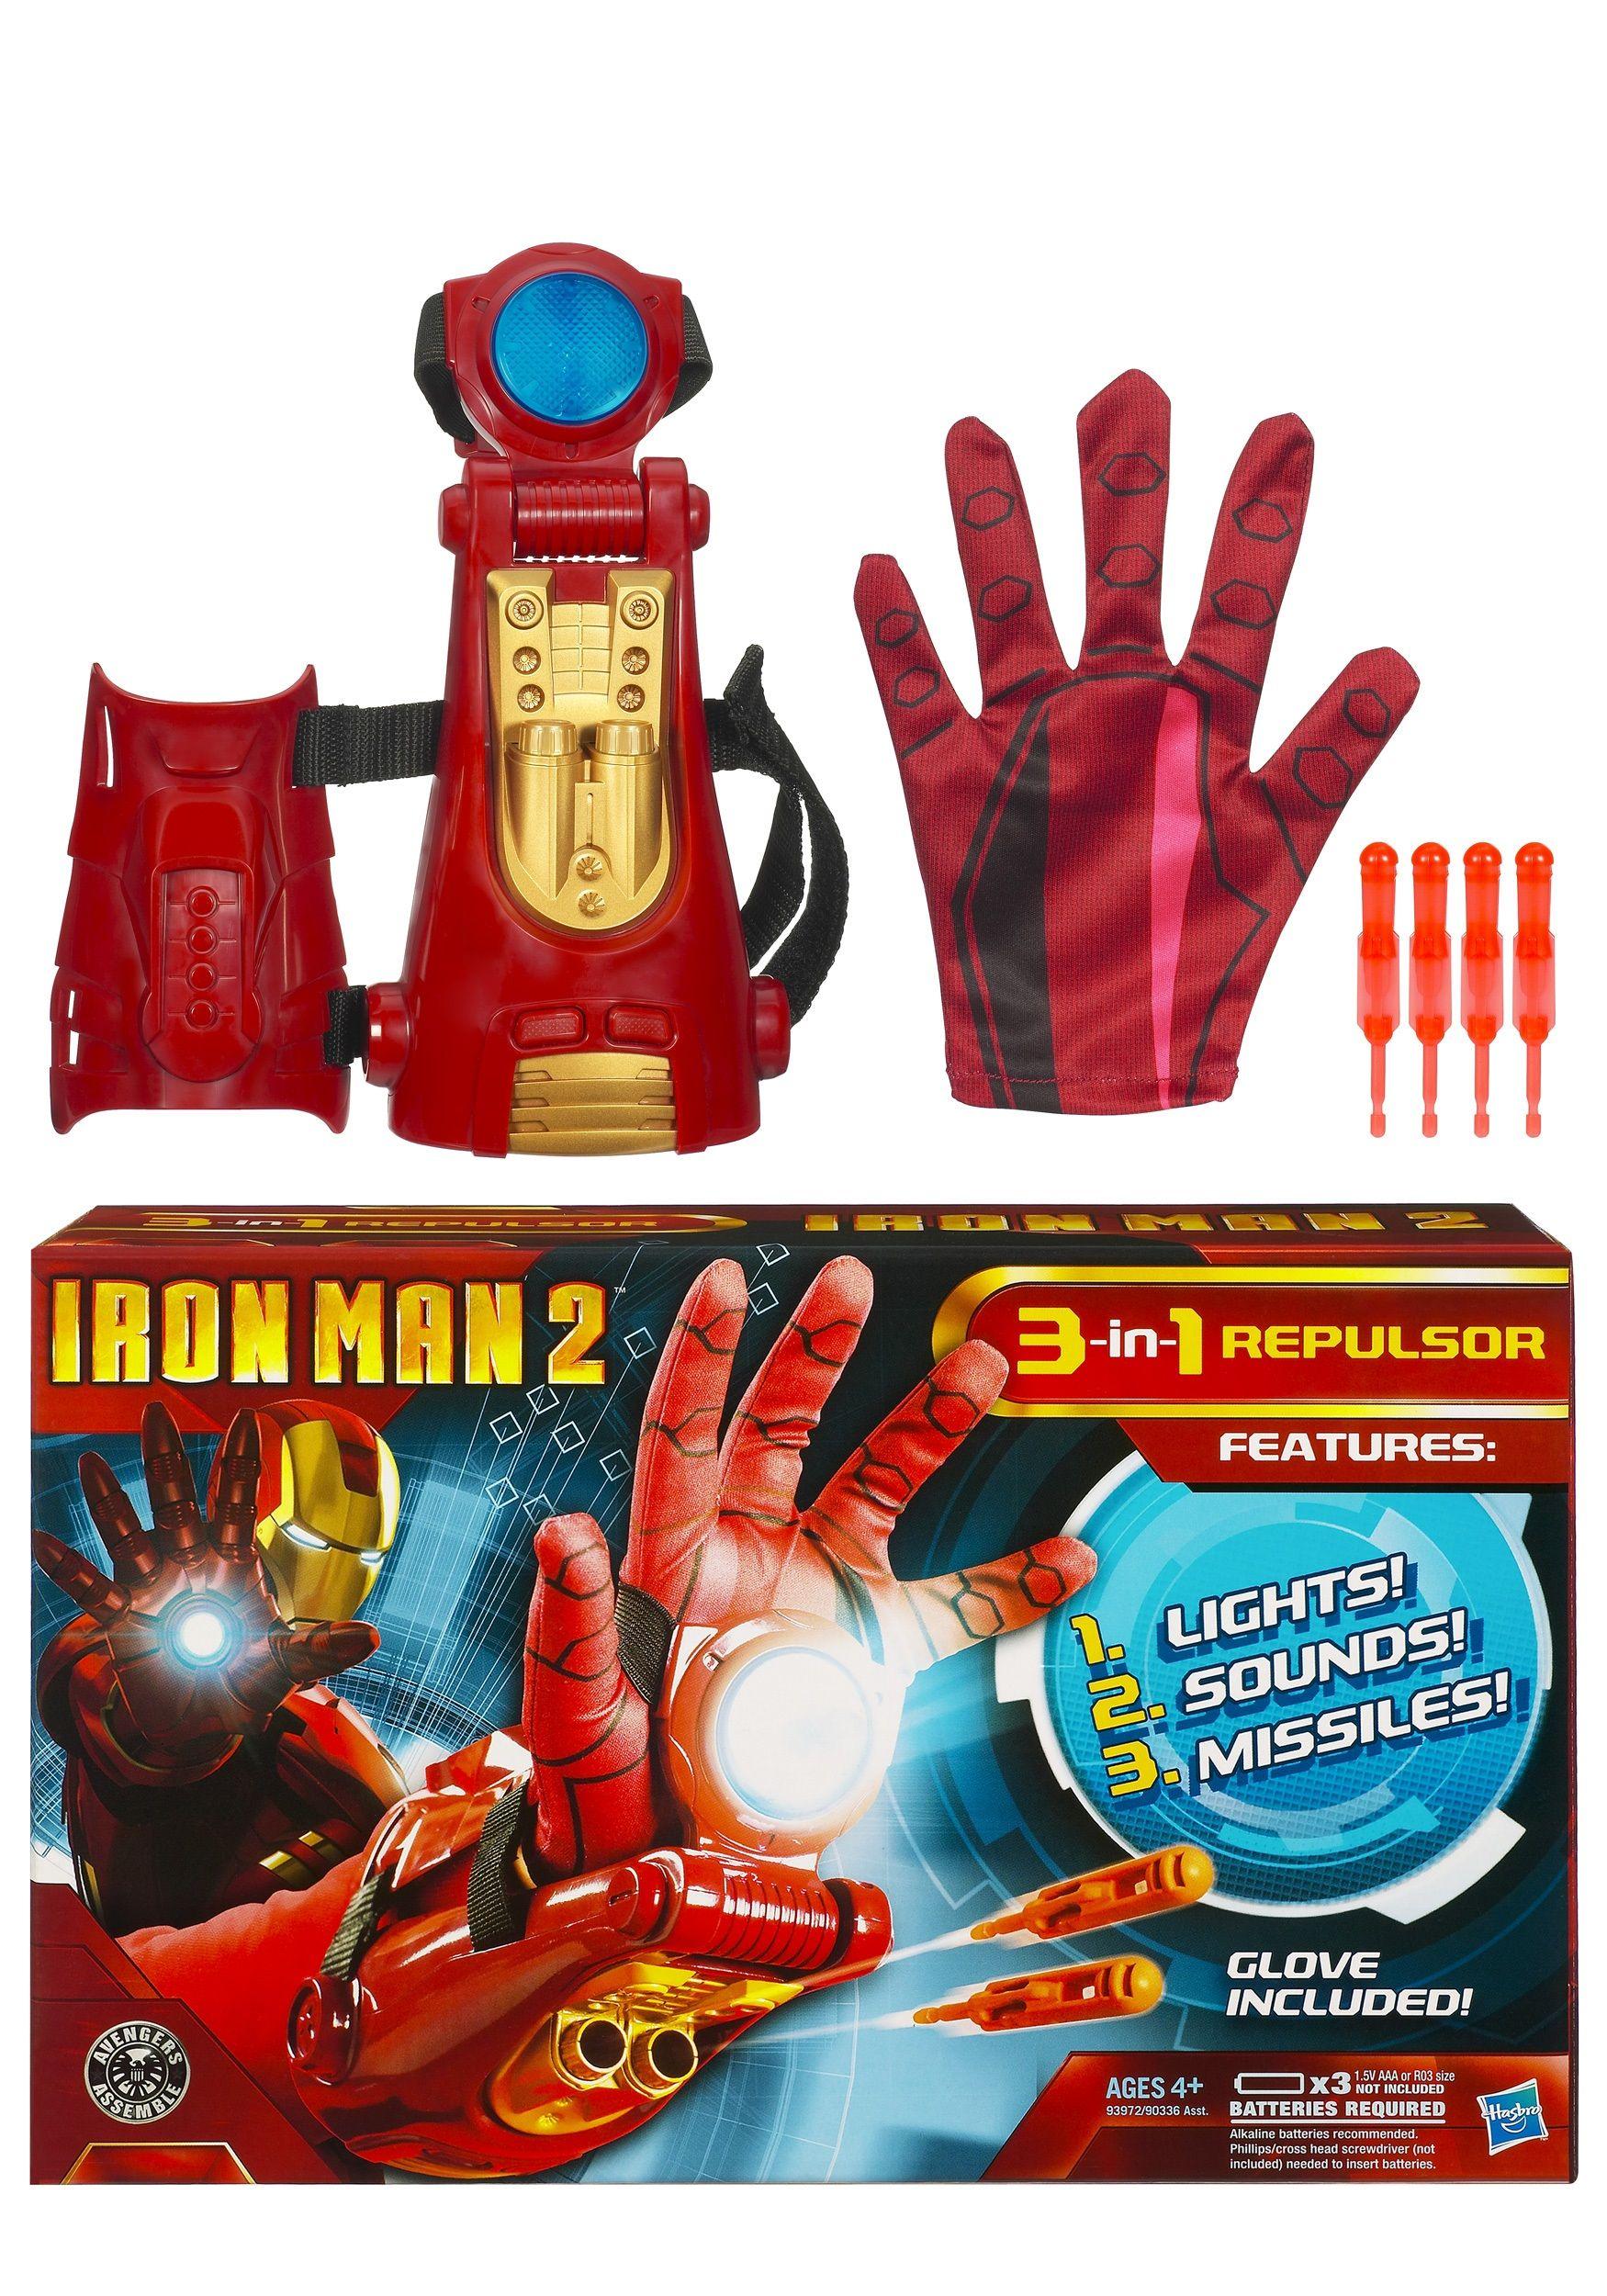 Kids Iron Man Repulsor Toy Iron Man Toys Costume Accessory